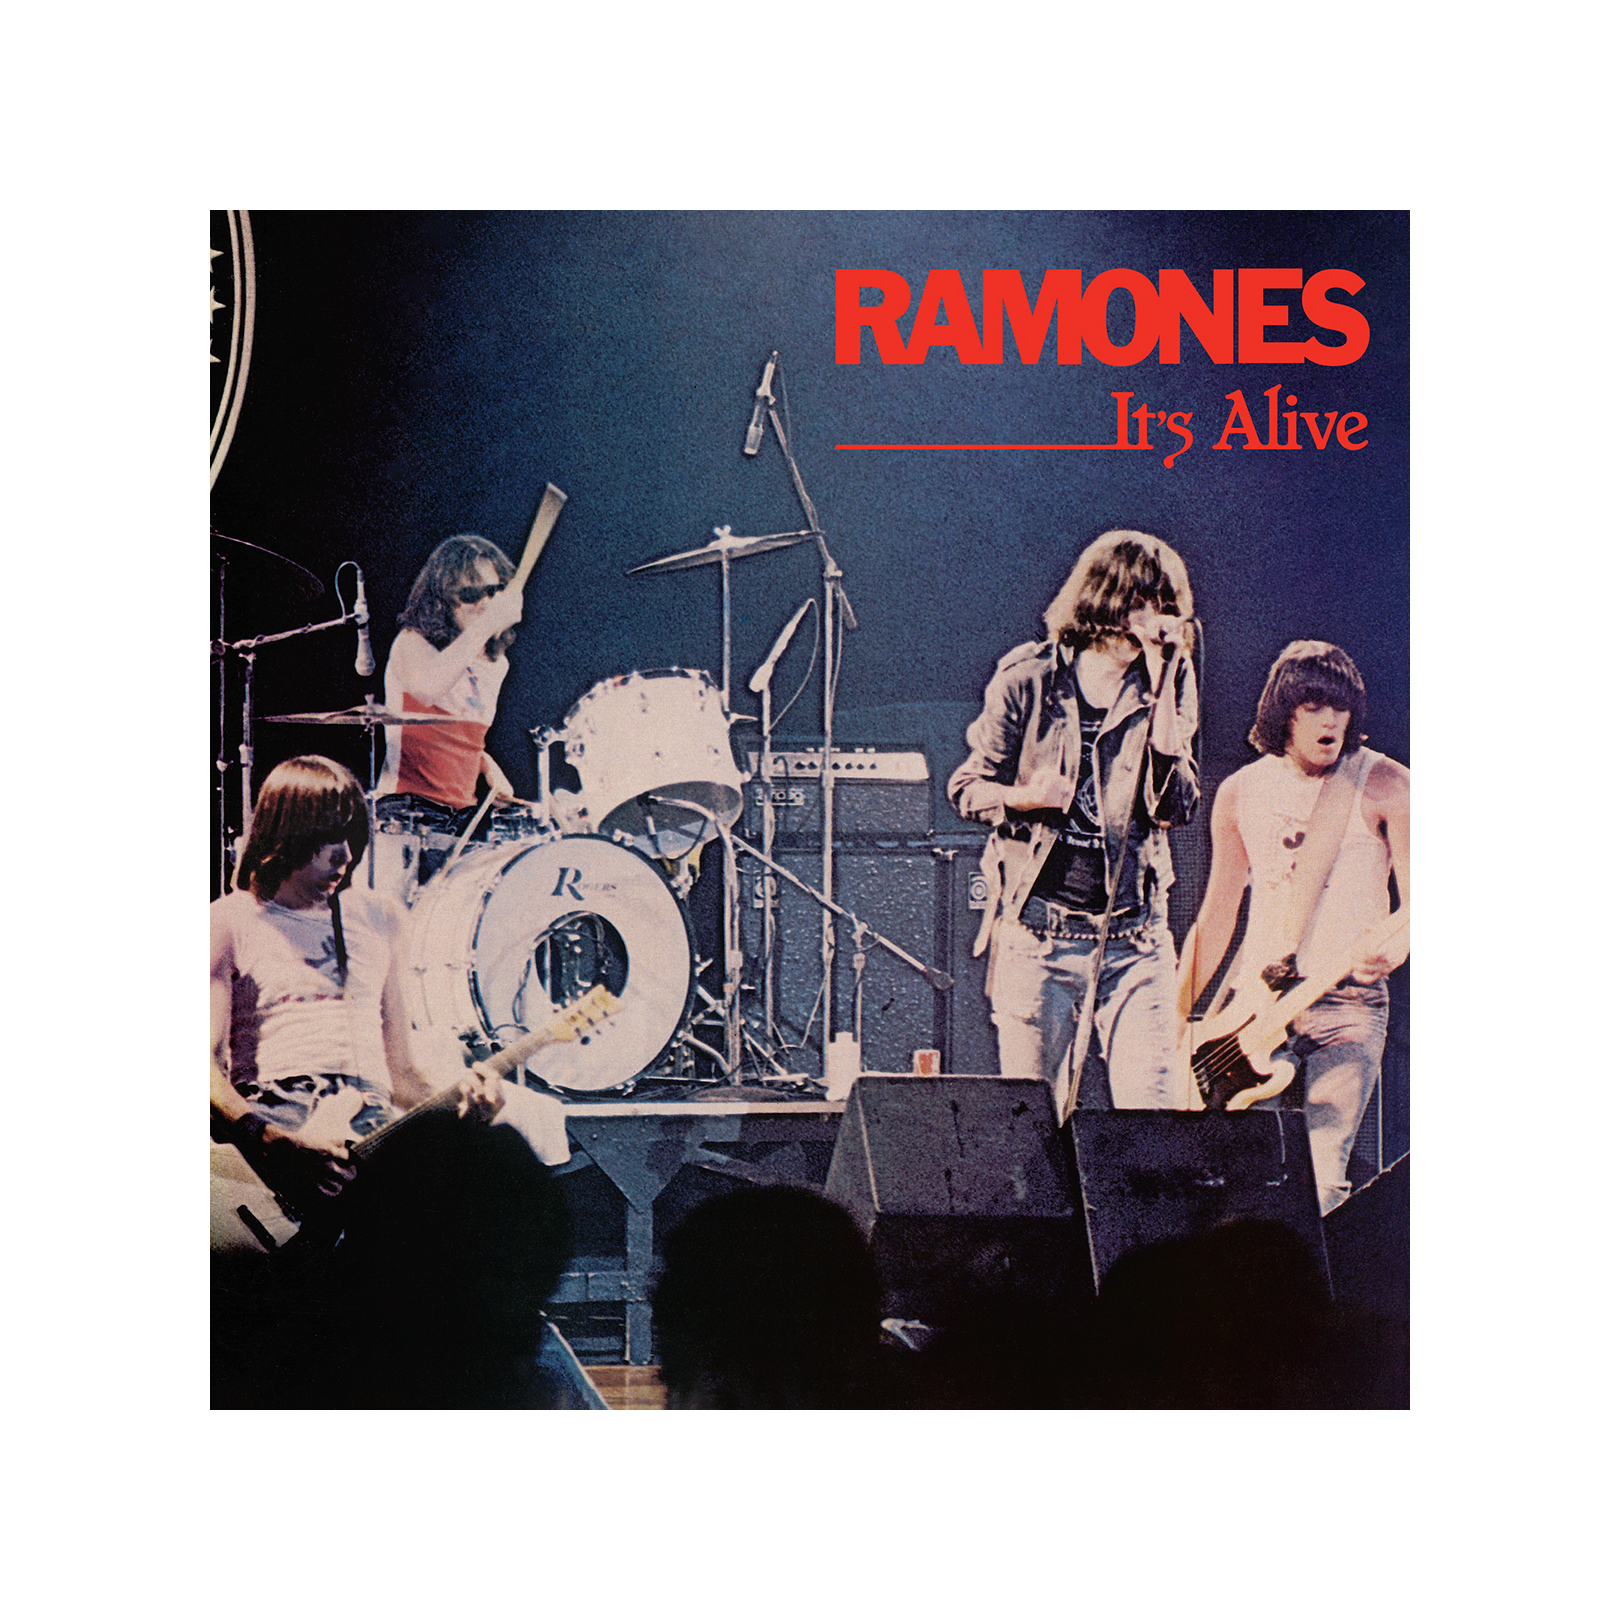 Ramones – It's Alive 40th Anniversary Deluxe Edition 4-CD/2-LP Set